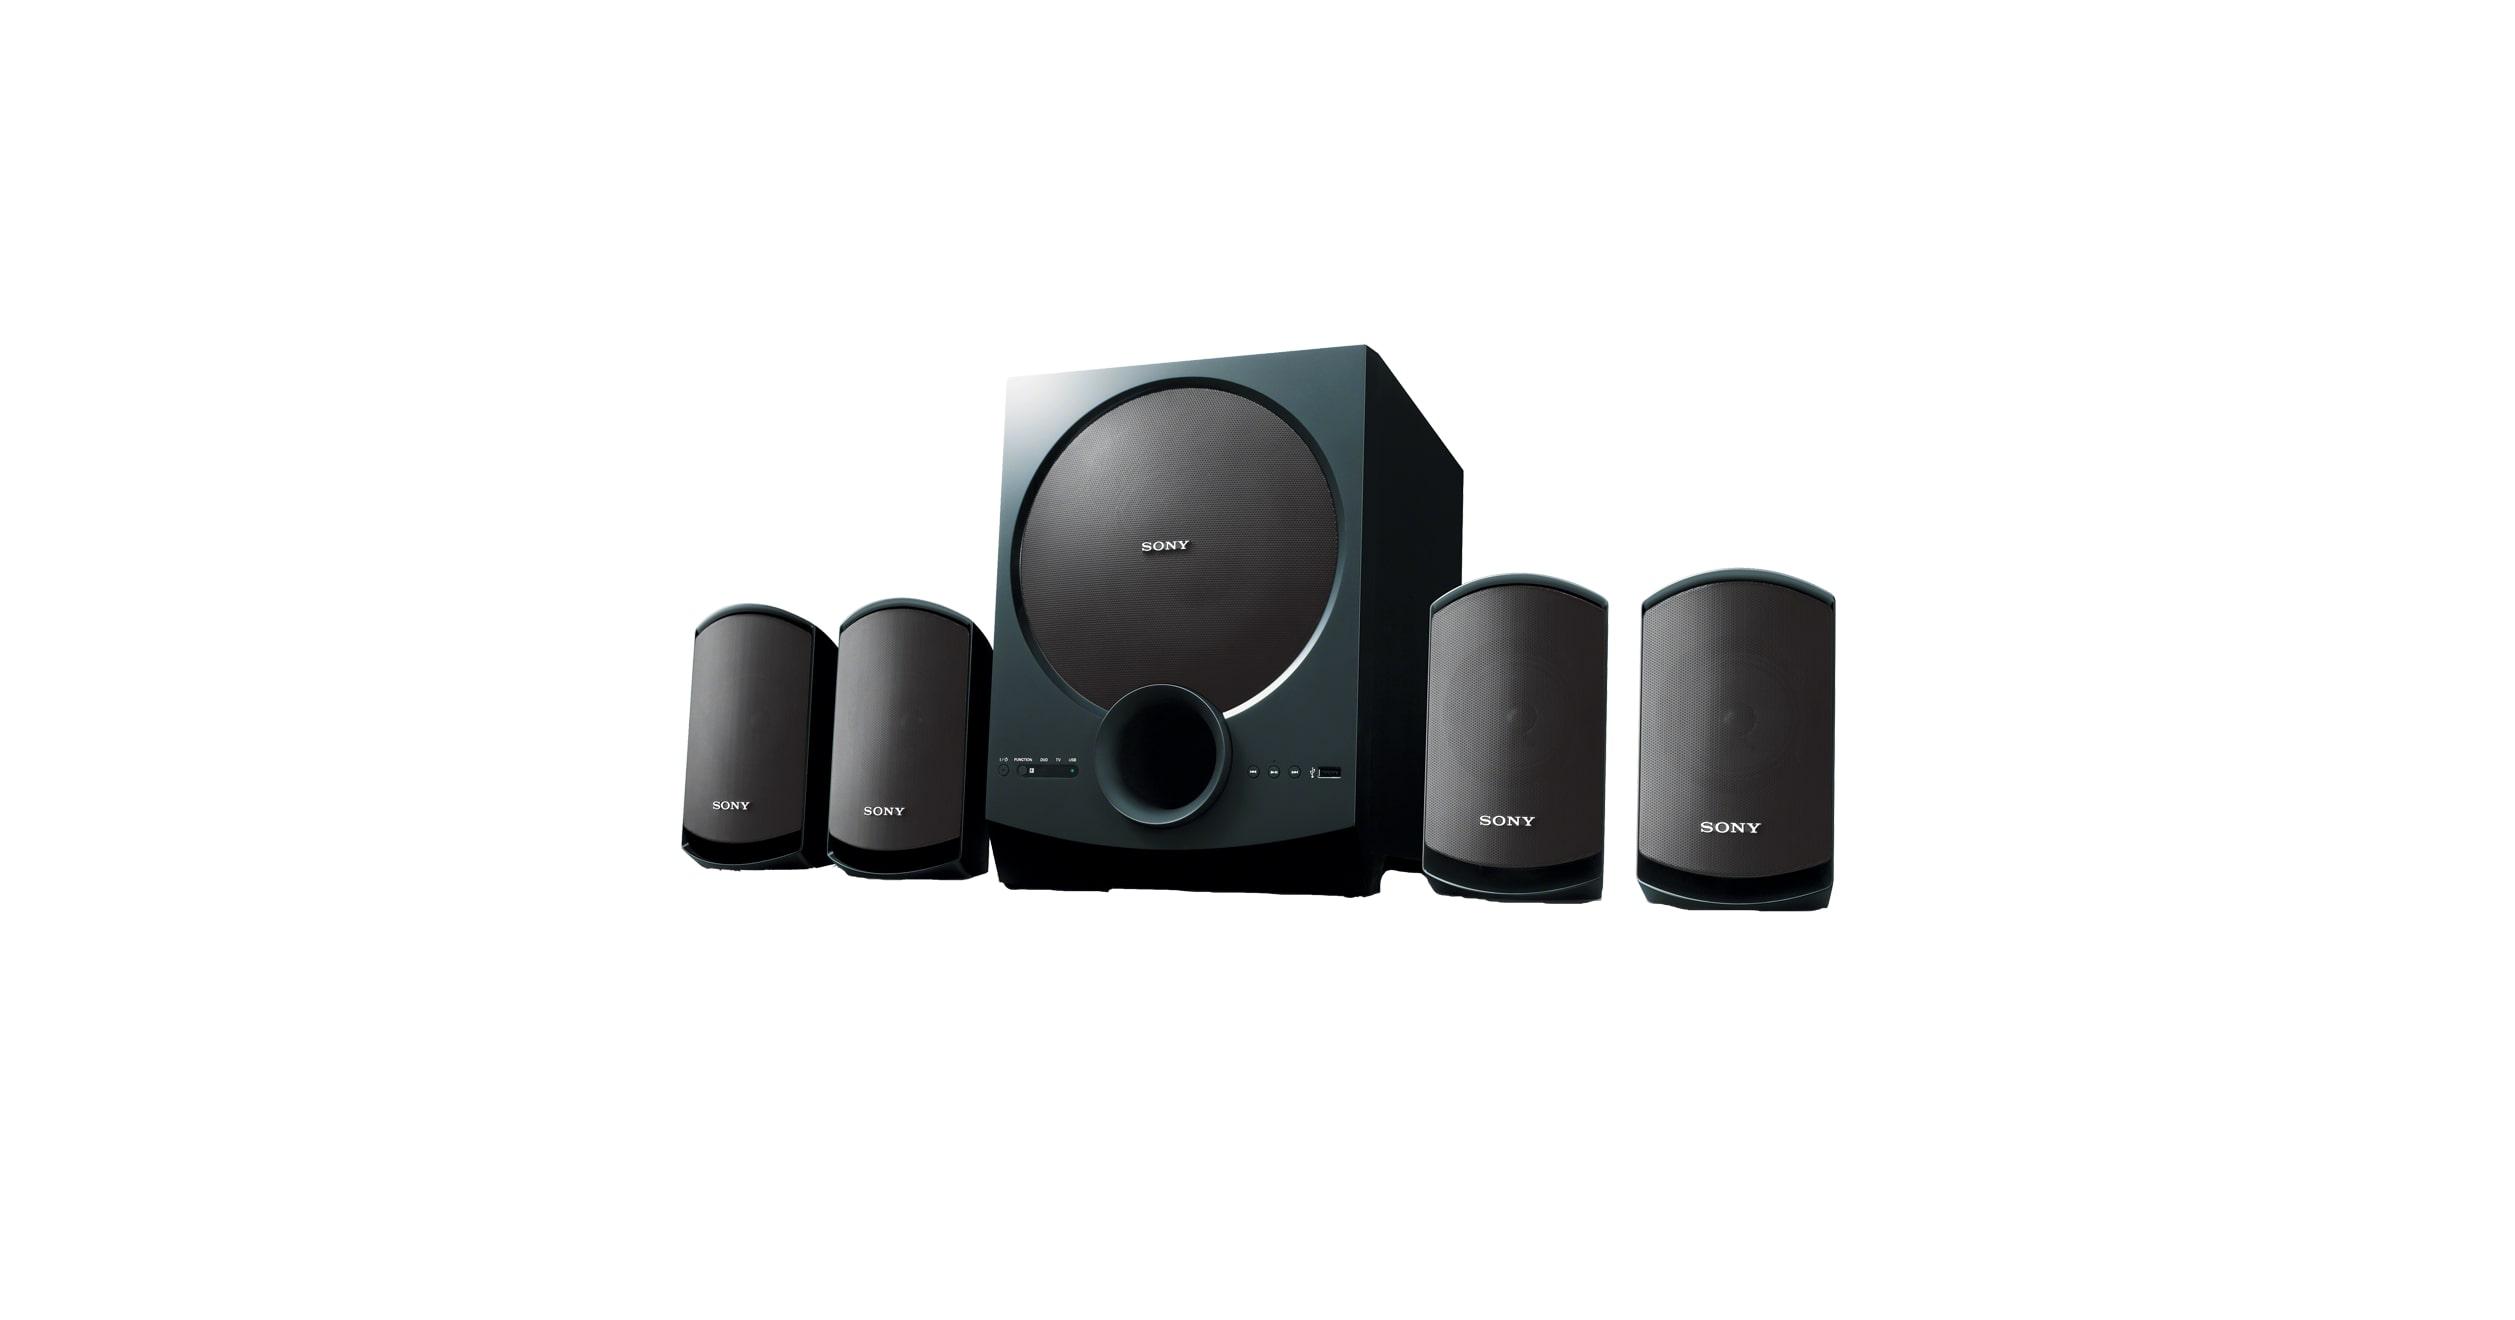 Home Theatre Satellite Speakers | USB Speakers | SA-D10 | Sony IN